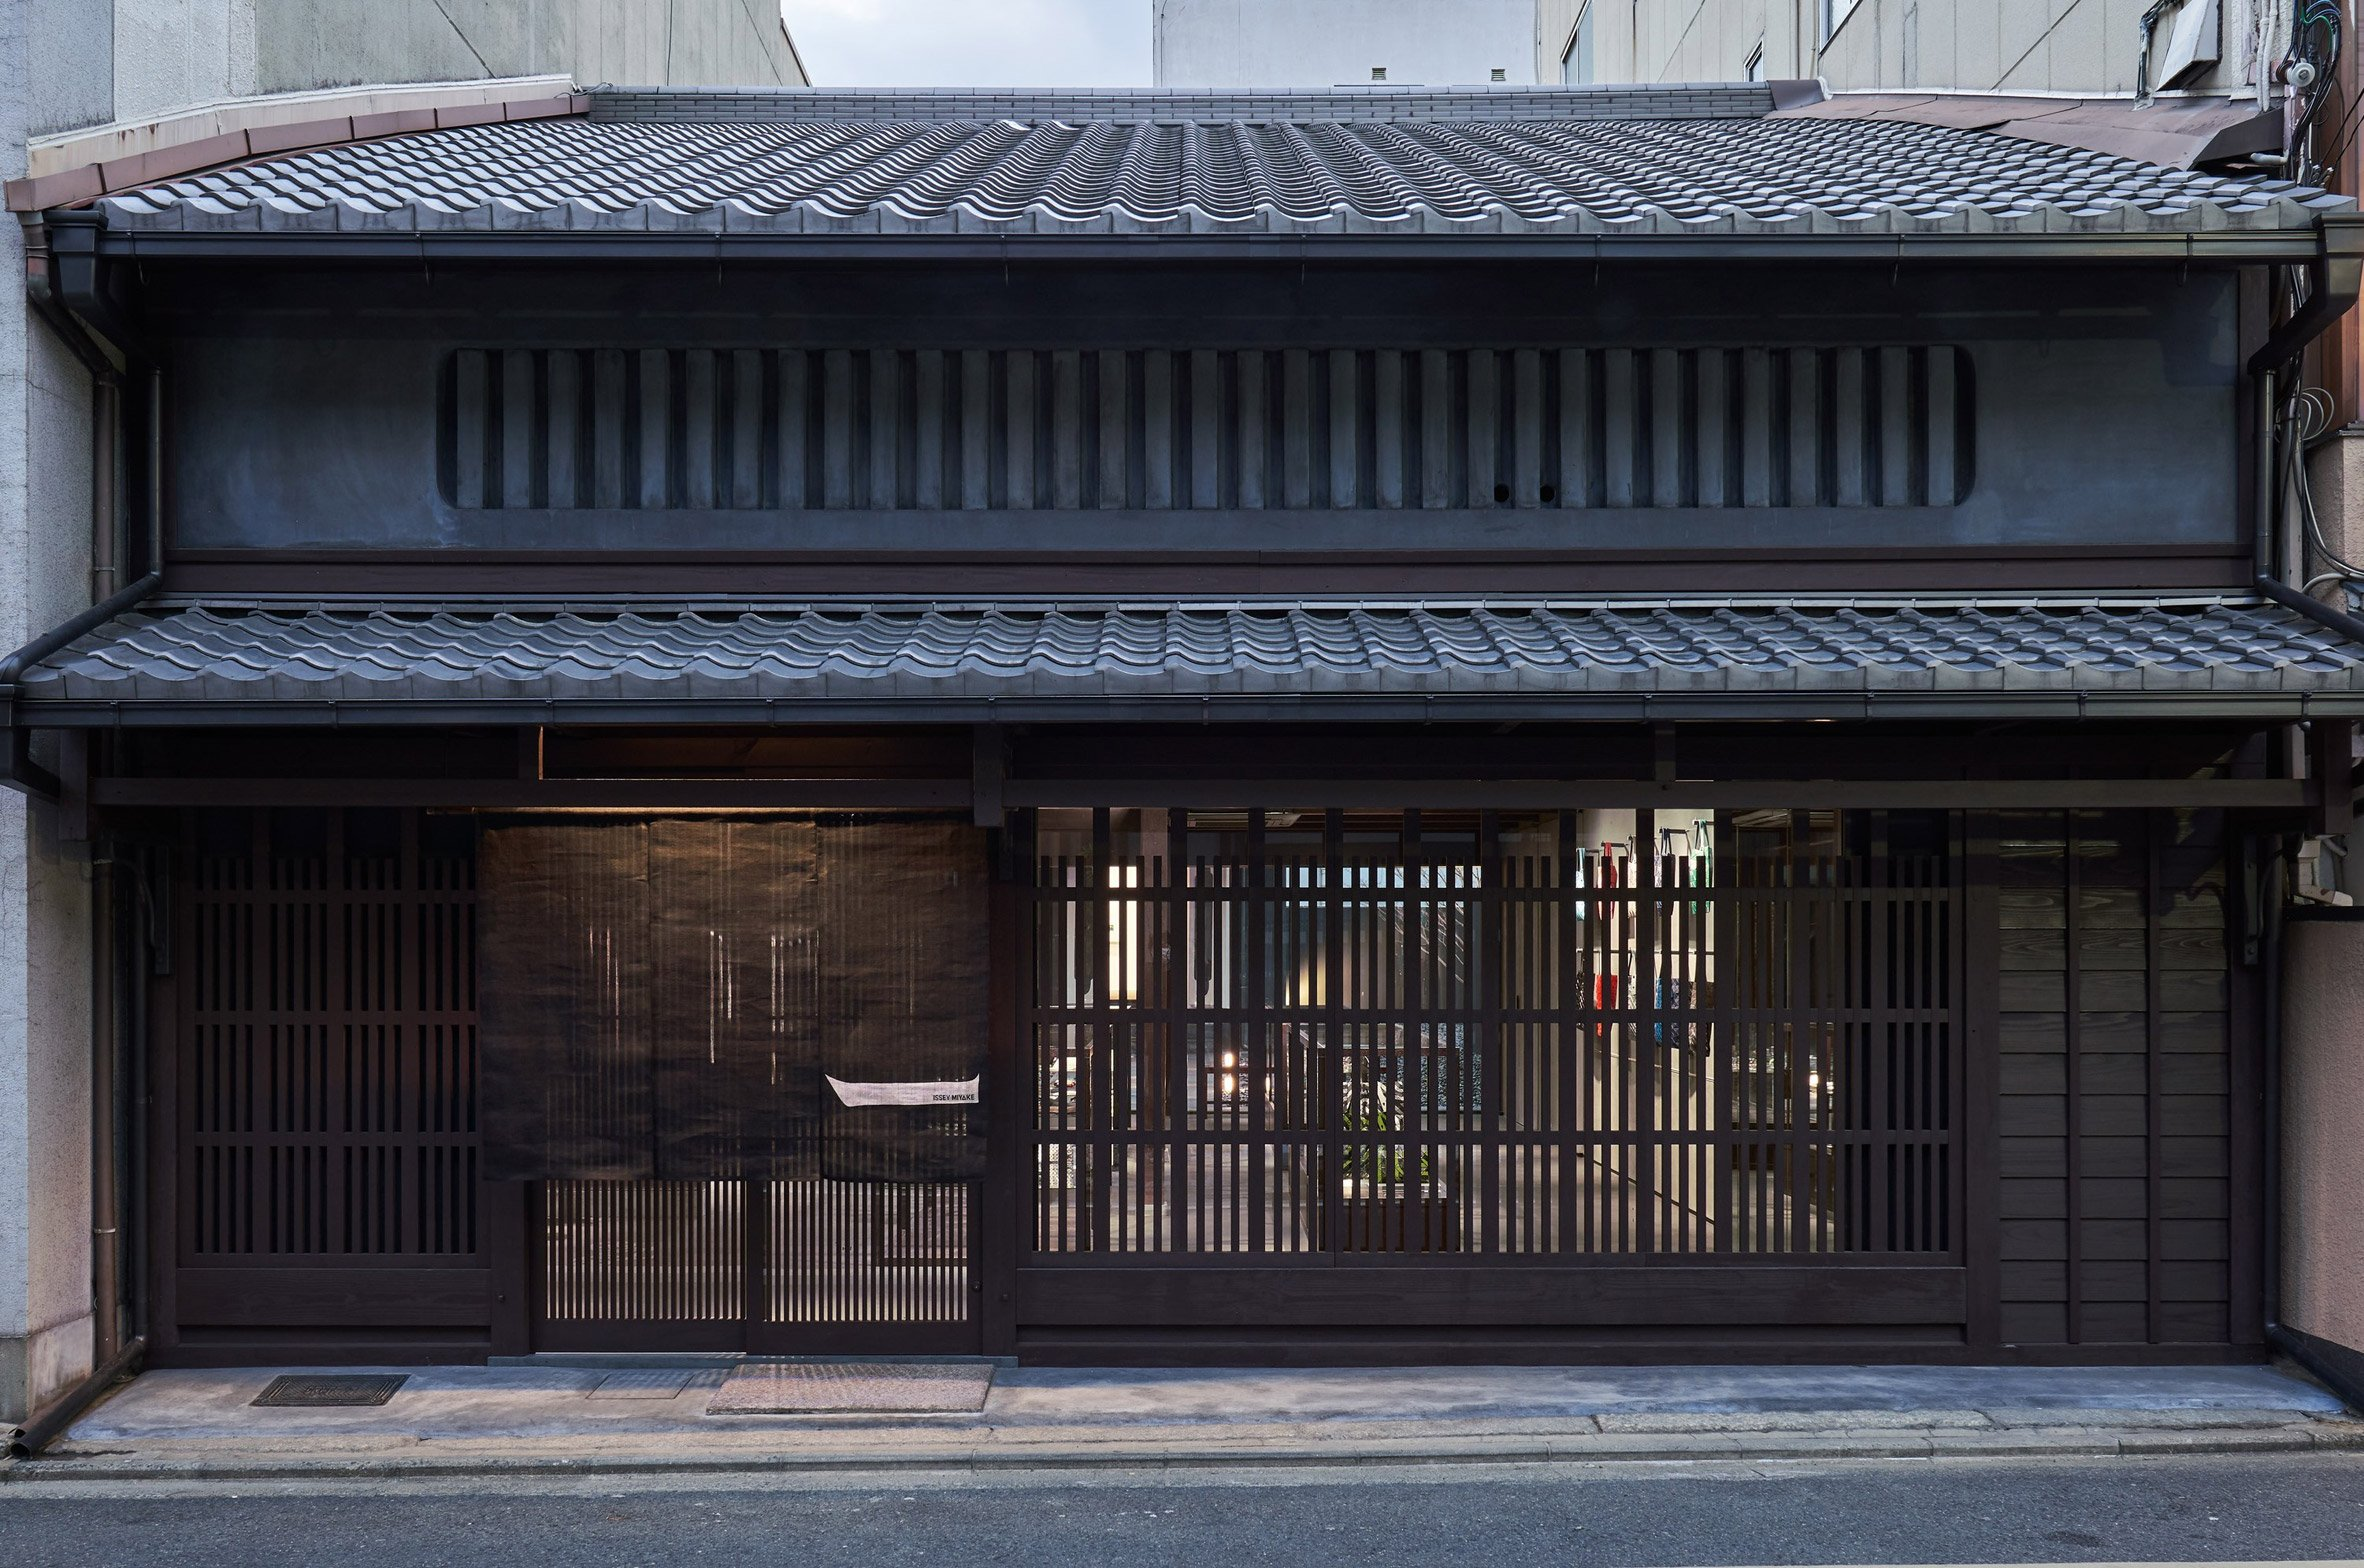 Naoto Fukasawa inserts Issey Miyake store into 132-year-old Kyoto townhouse